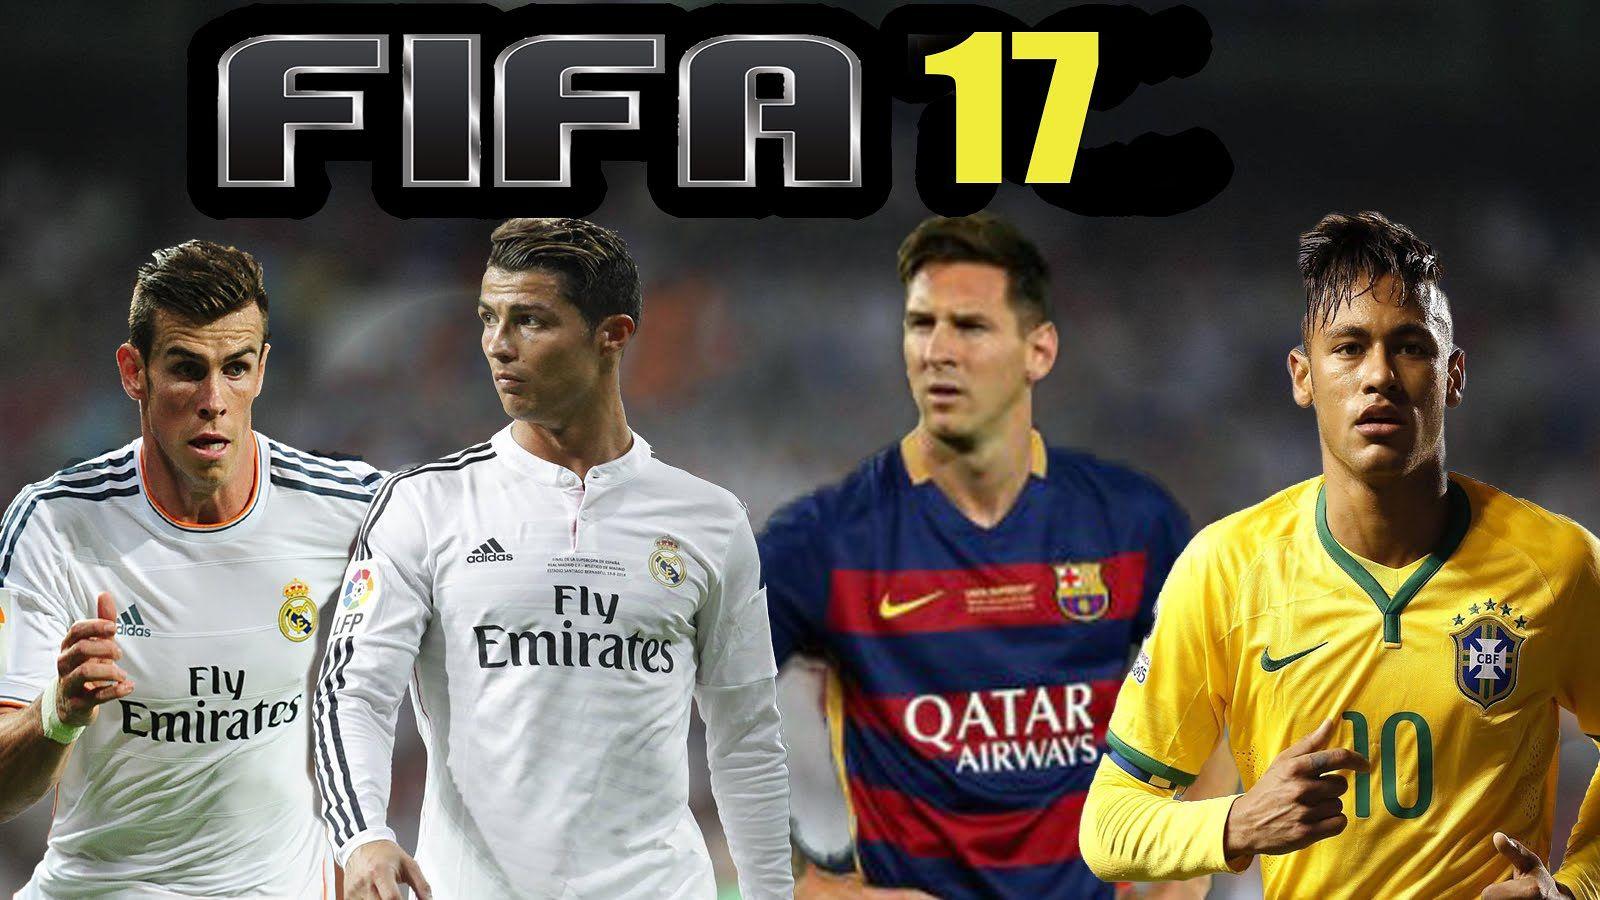 fifa17-cover-star